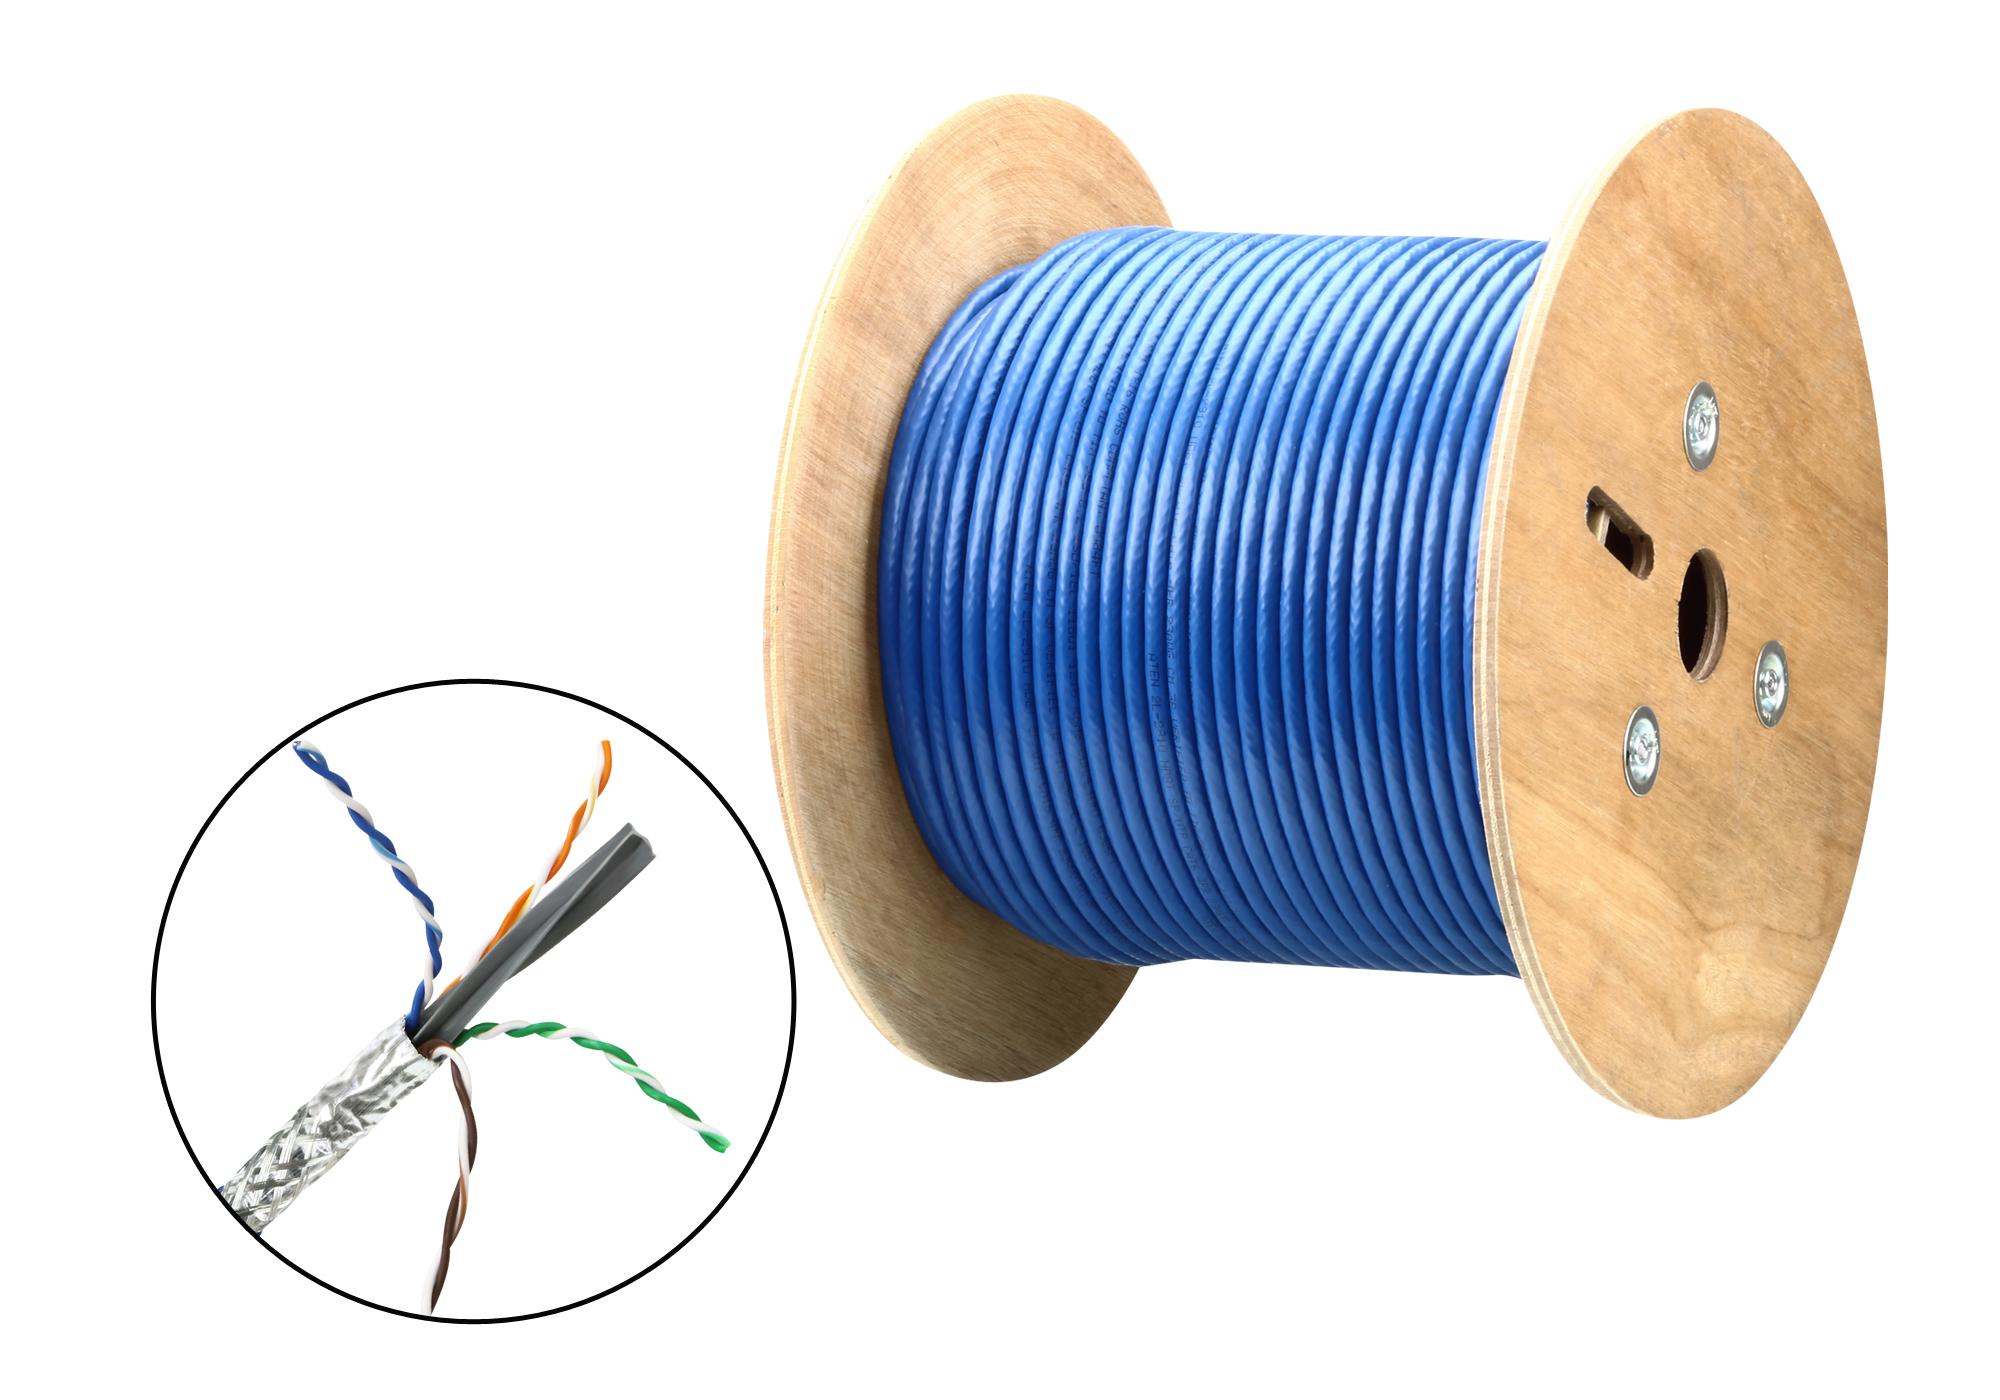 Rj45 Telephone Wiring Diagram